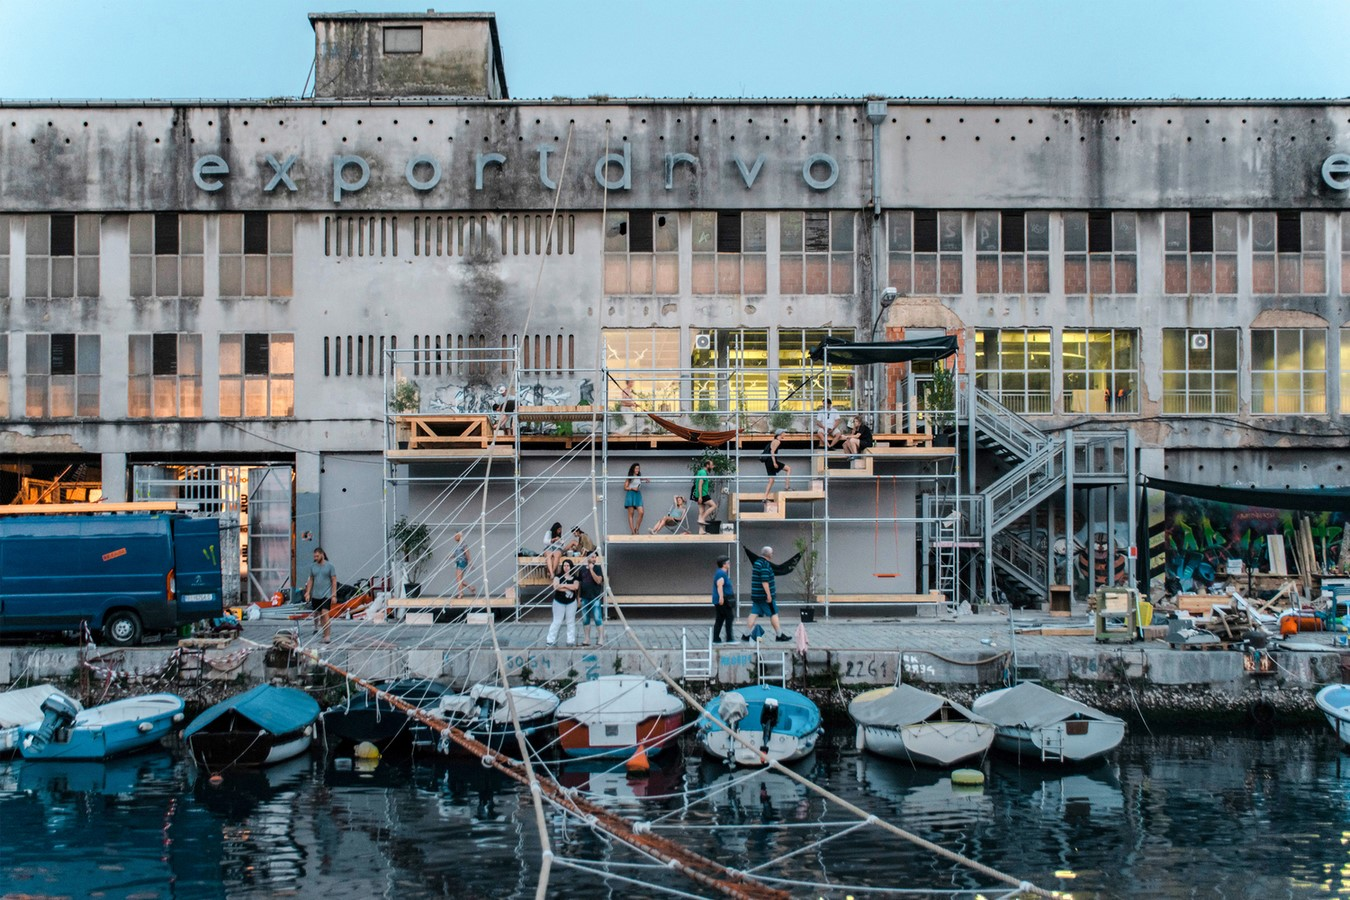 Urban regeneration through public space - Sheet10